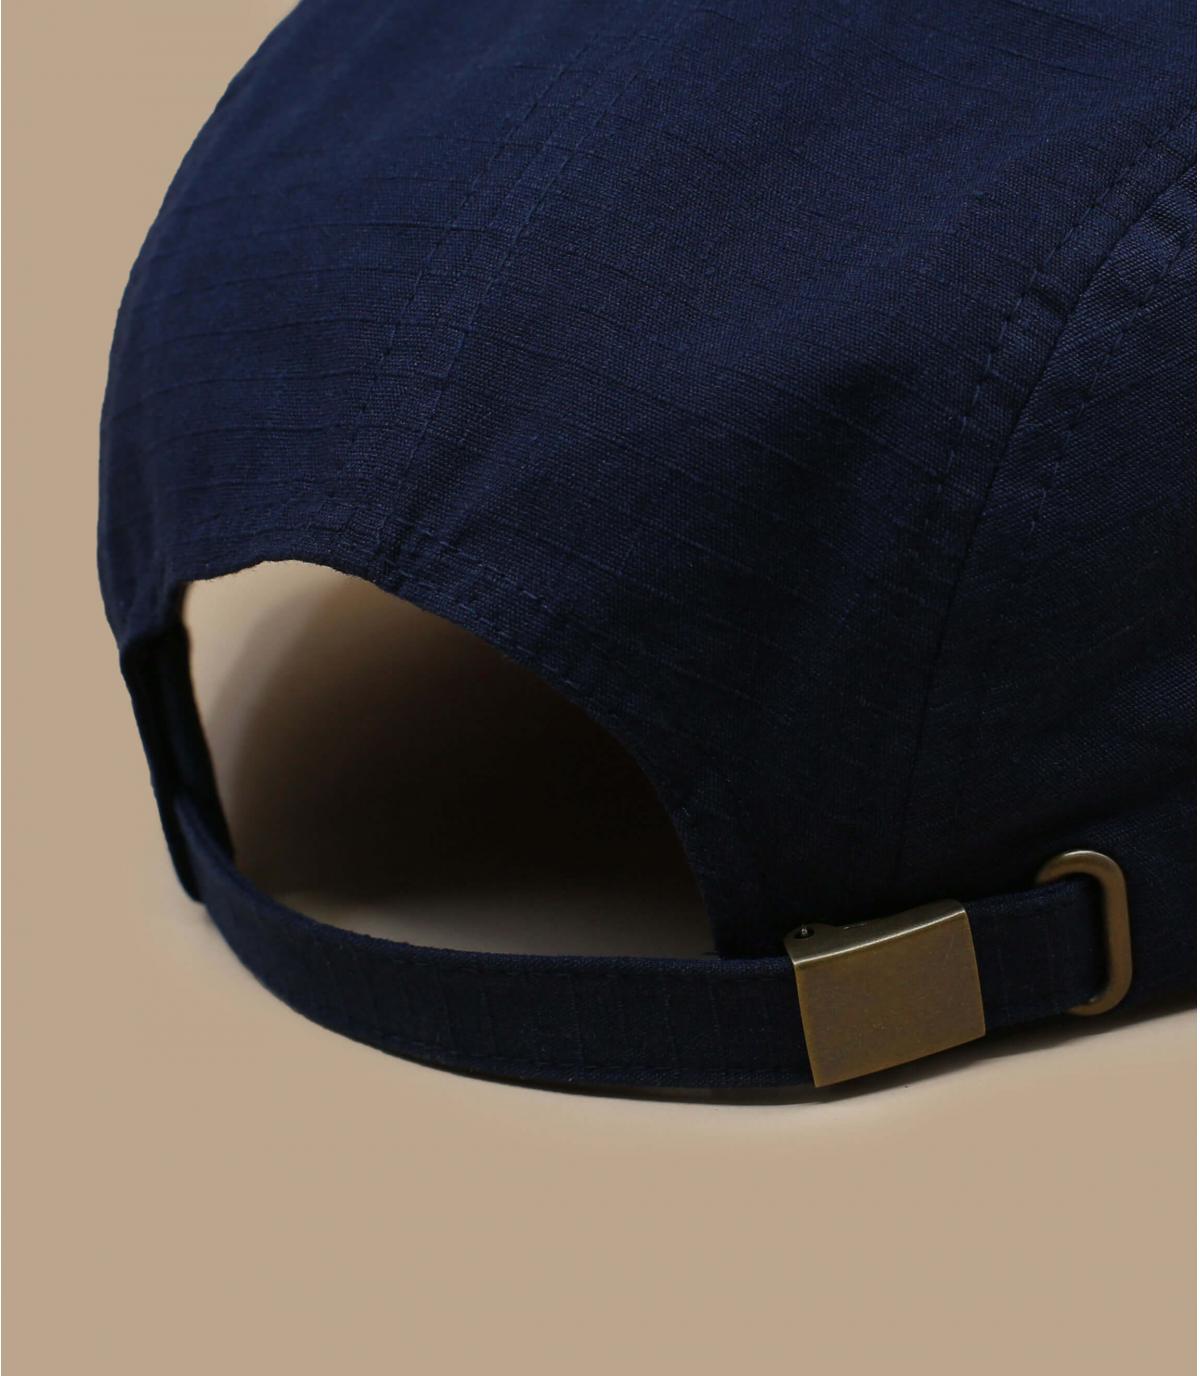 Details Kids Oath Snapback black navy tie dye - Abbildung 3